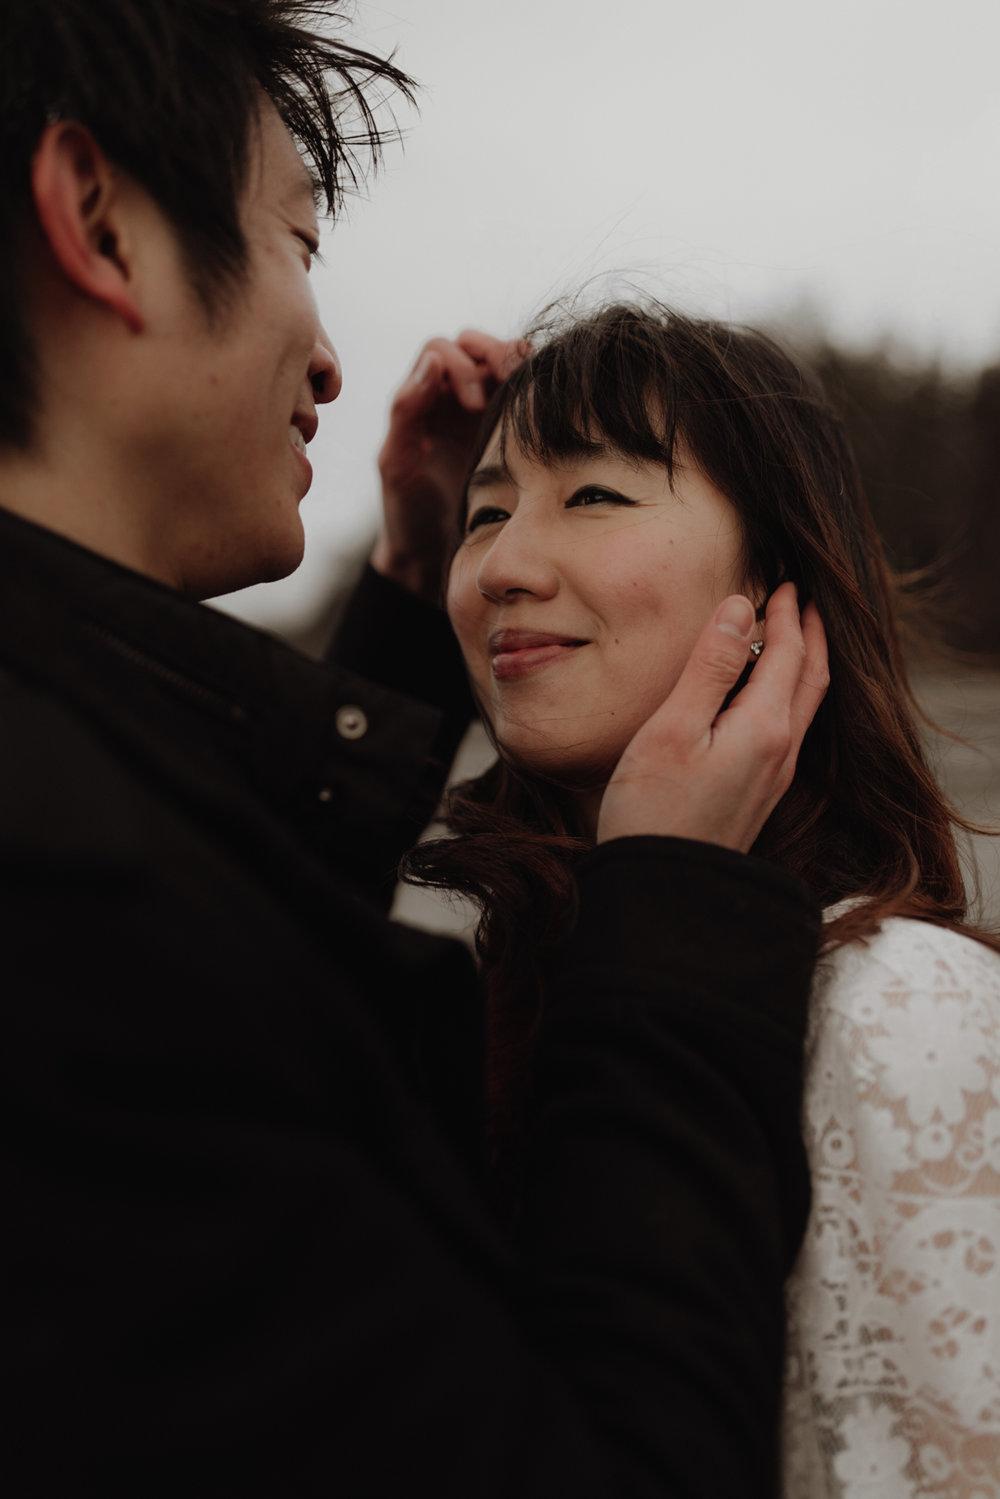 seattle-wedding-photographer-kerouac-0205.jpg